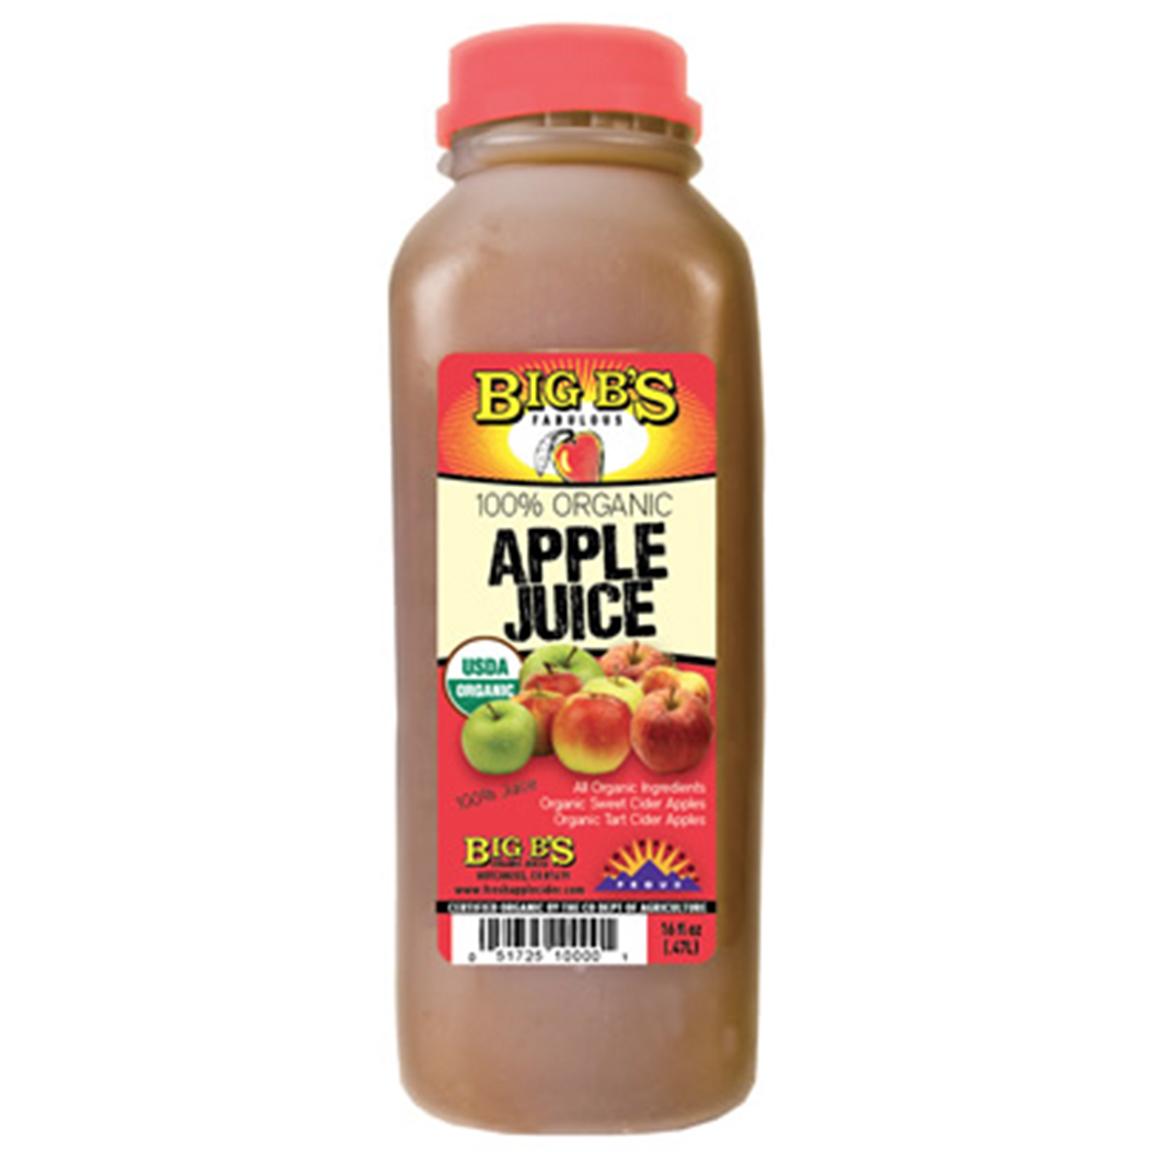 Big B's Apple Juice